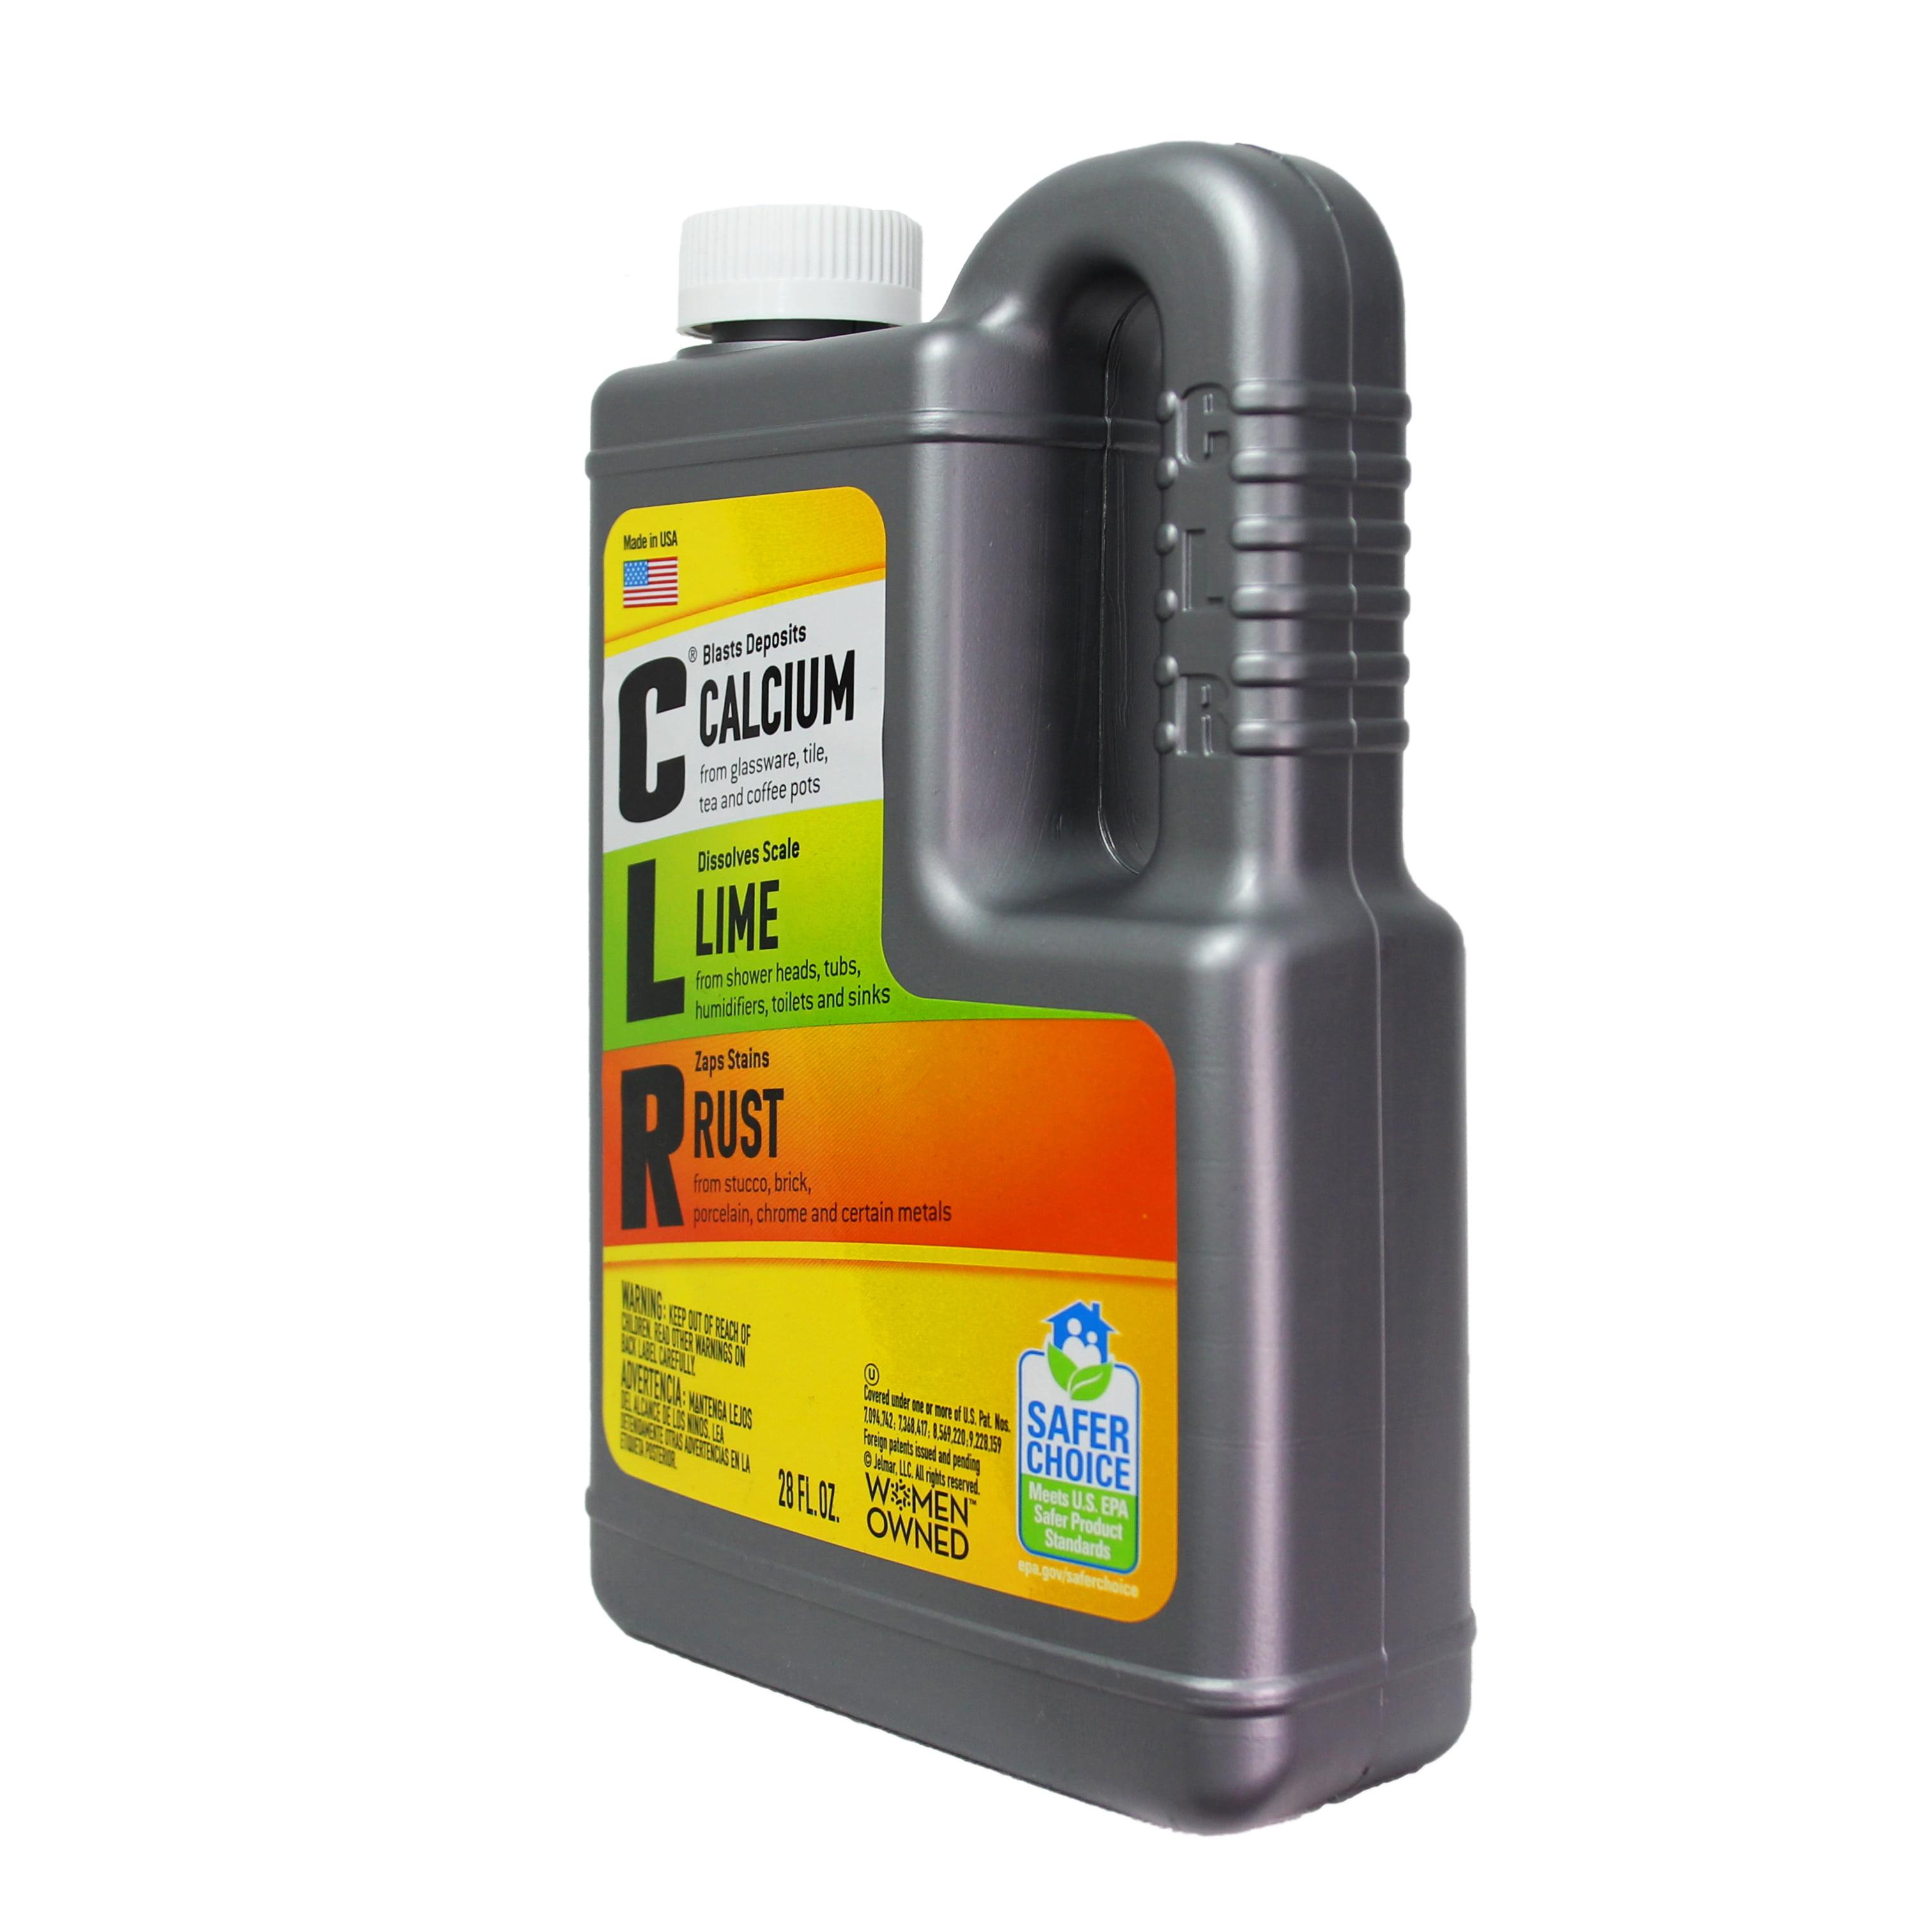 CLR Calcium, Lime & Rust Remover, Biodegradable, 28 Oz Bottle ...